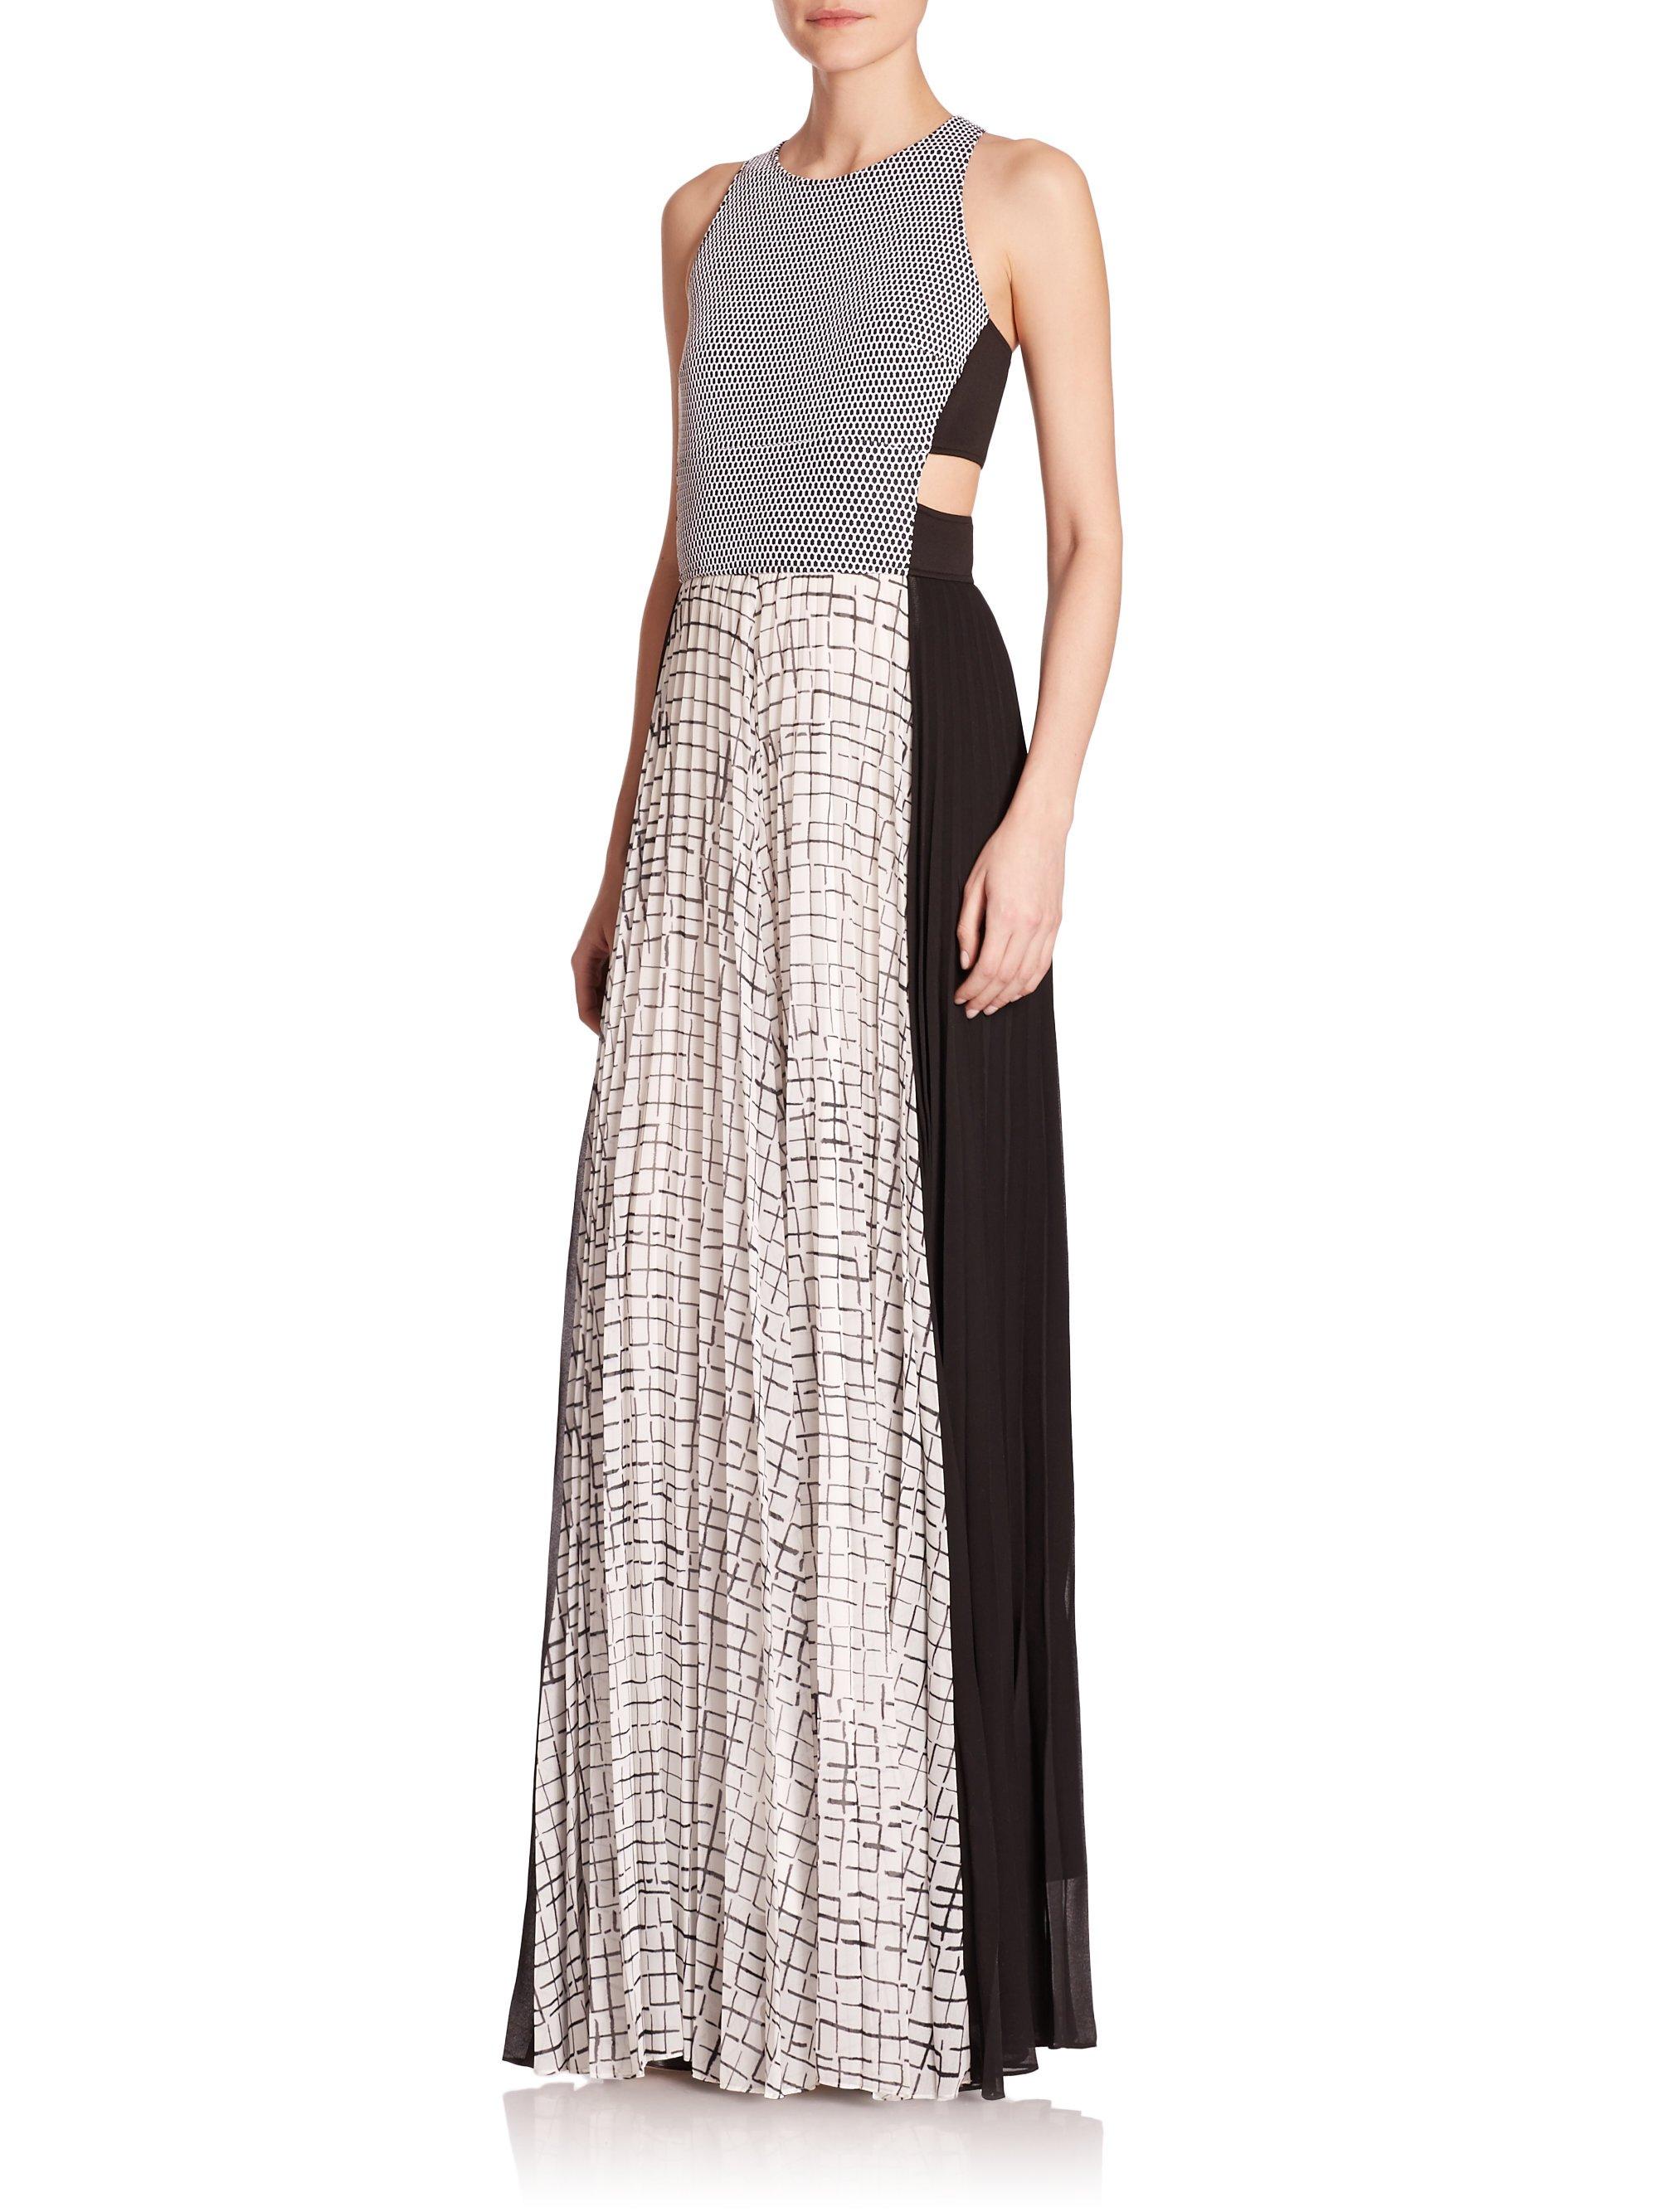 Sachin and babi maxi dresses – Dresses dragon blog